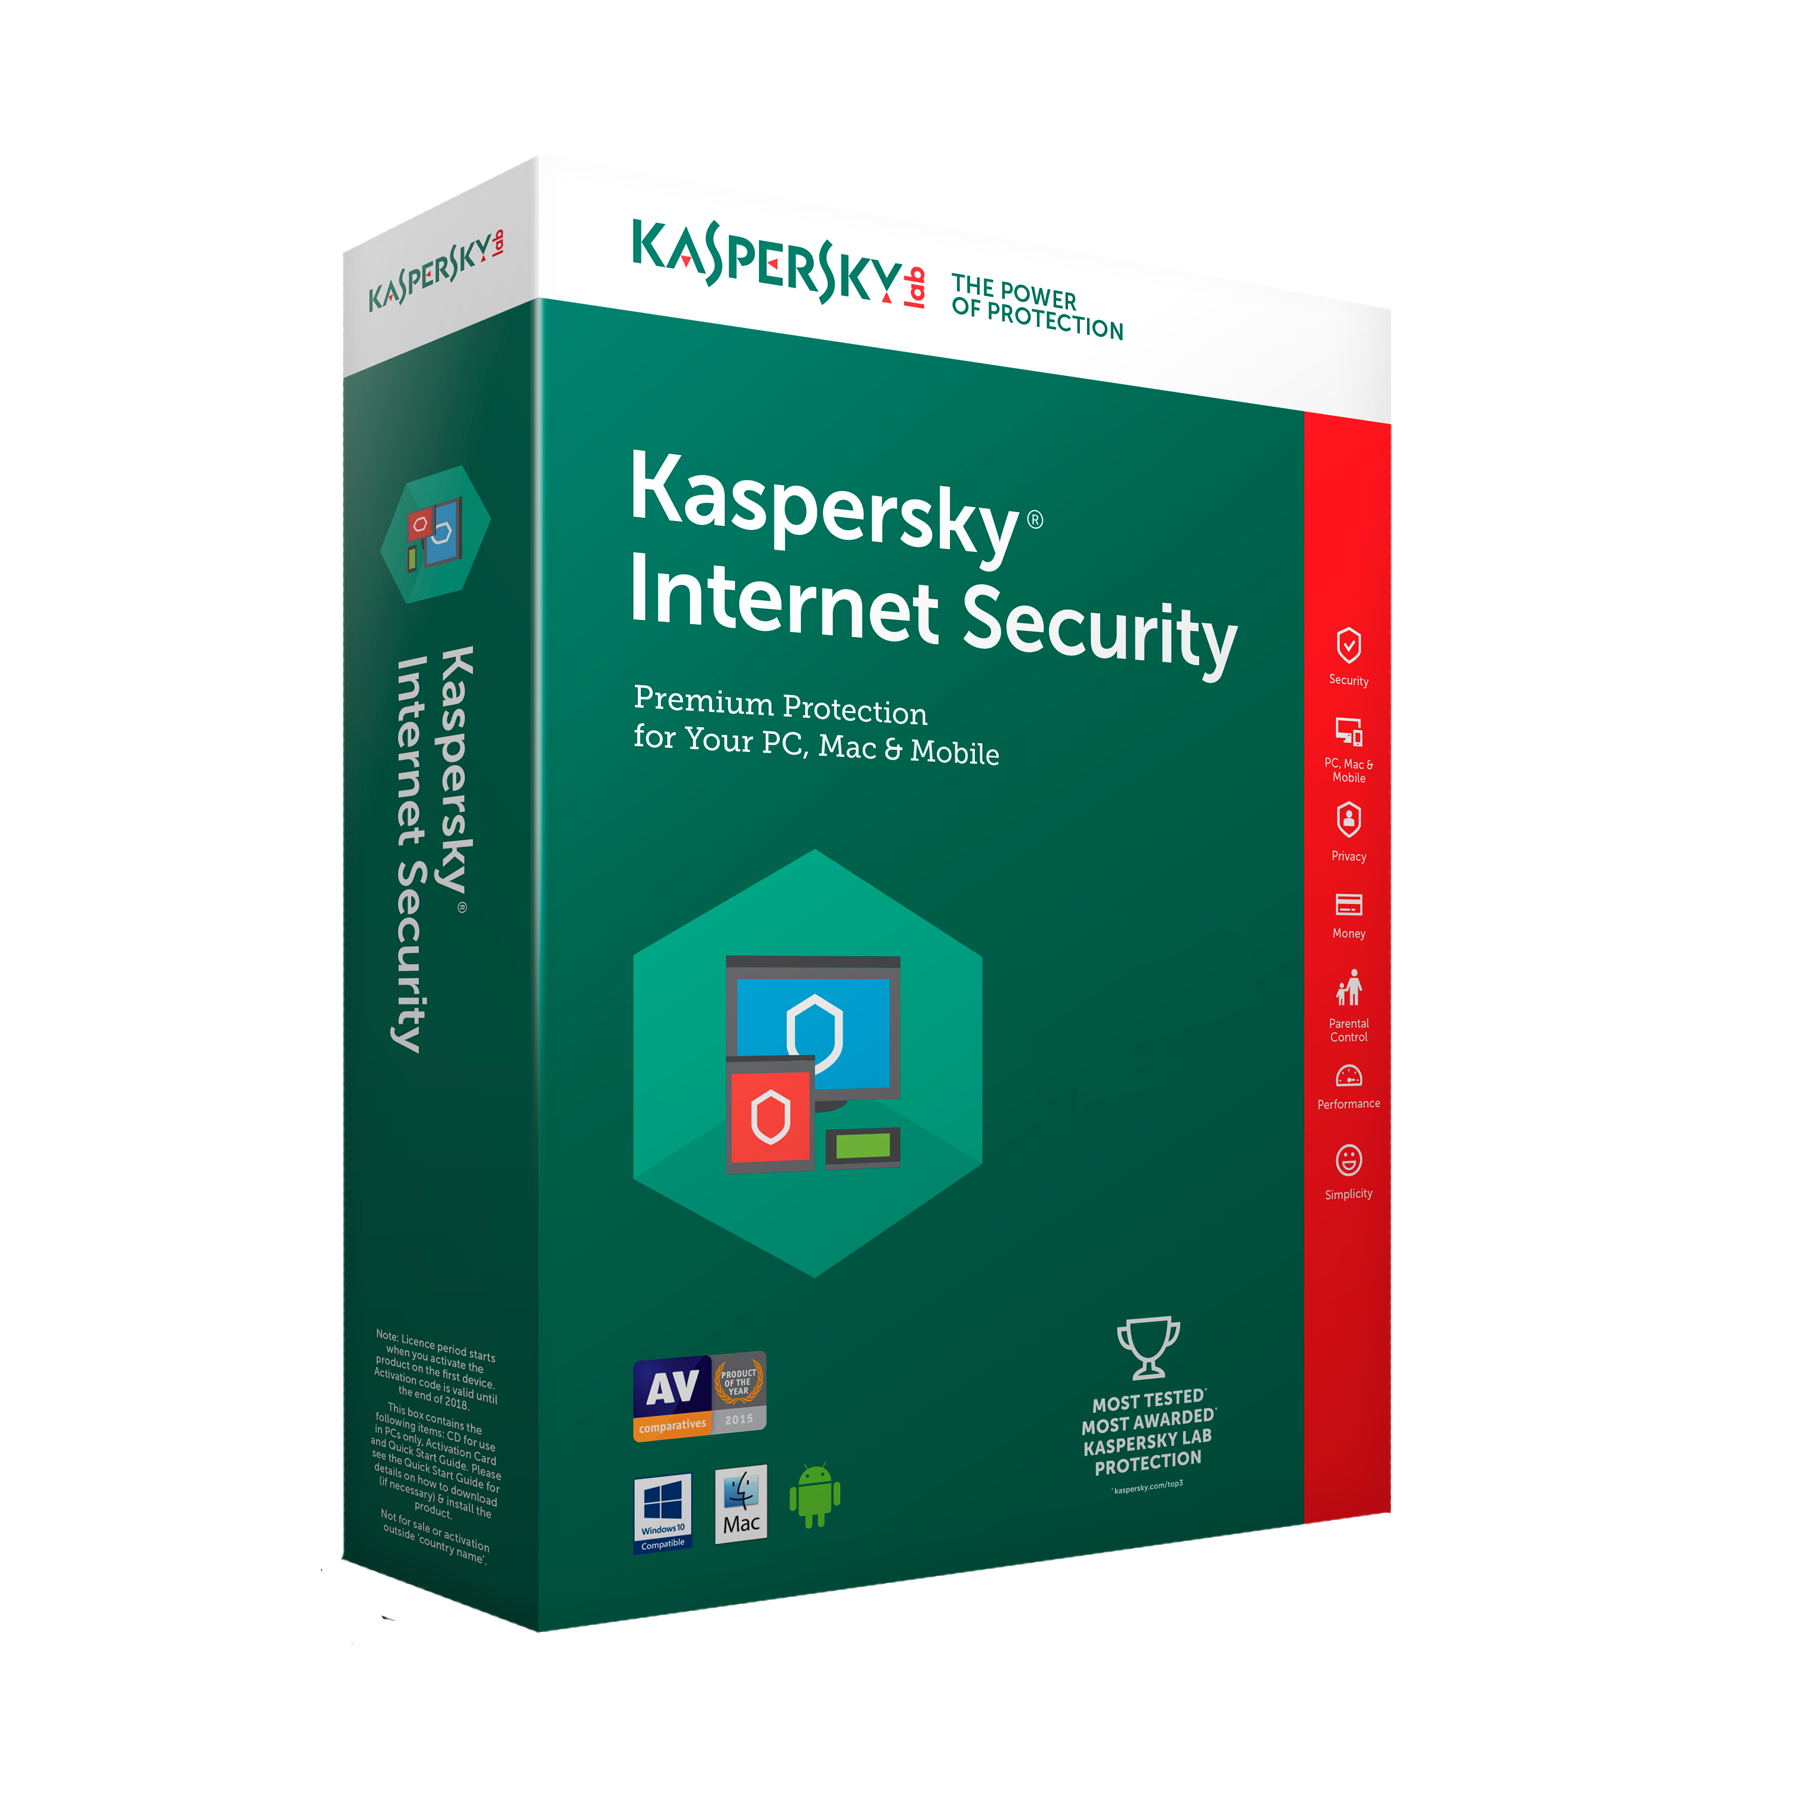 kaspersky internet security product